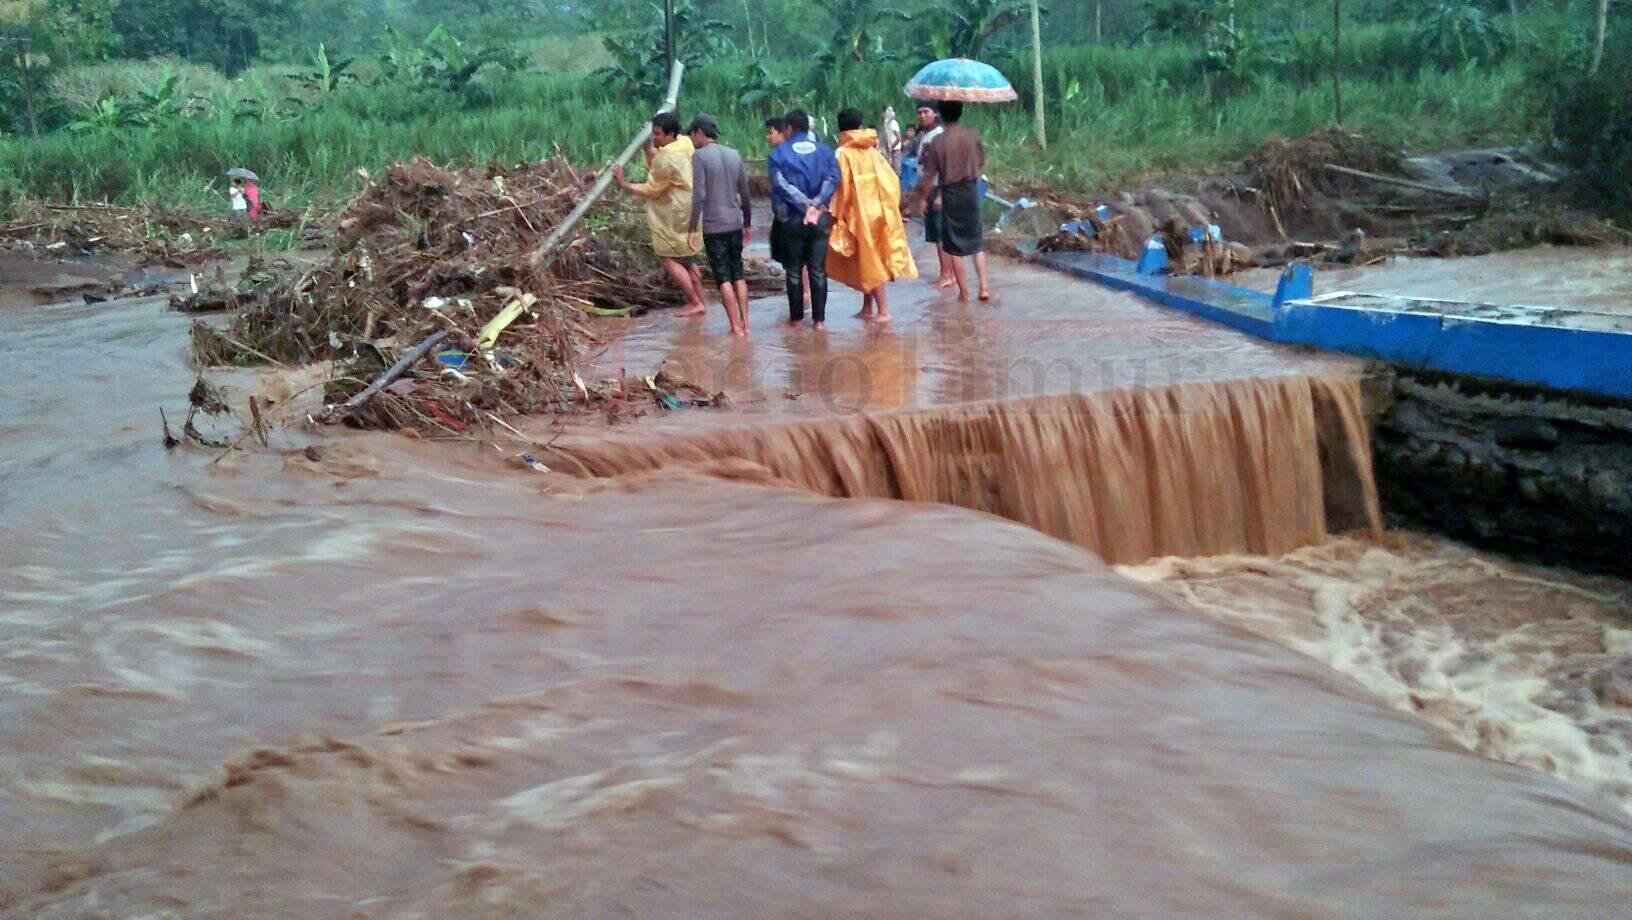 Jembatan Penghubung Desa Jatisari-Tempursari Putus Akibat Sungai Meluap